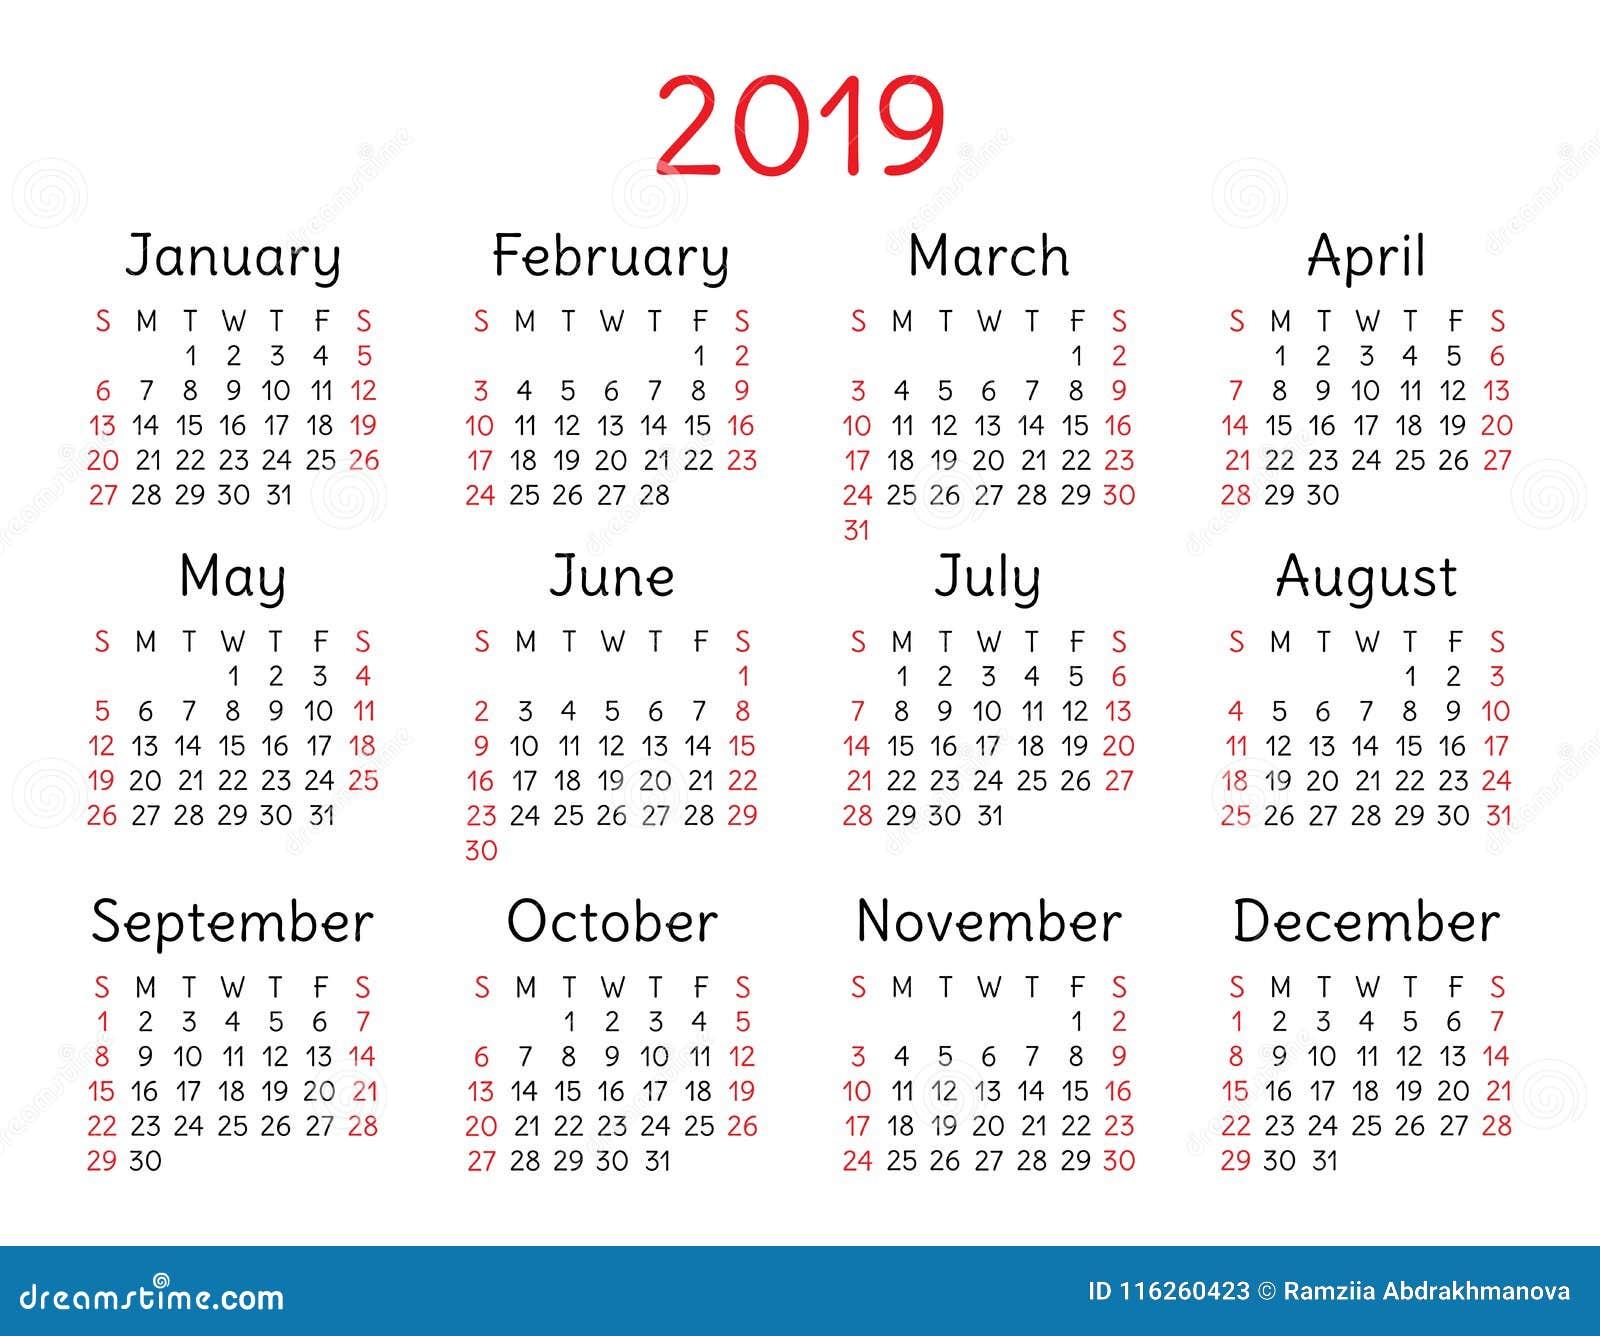 Semana Calendario.Calendario 2019 Bolsillo Comienzo De La Semana El Domingo